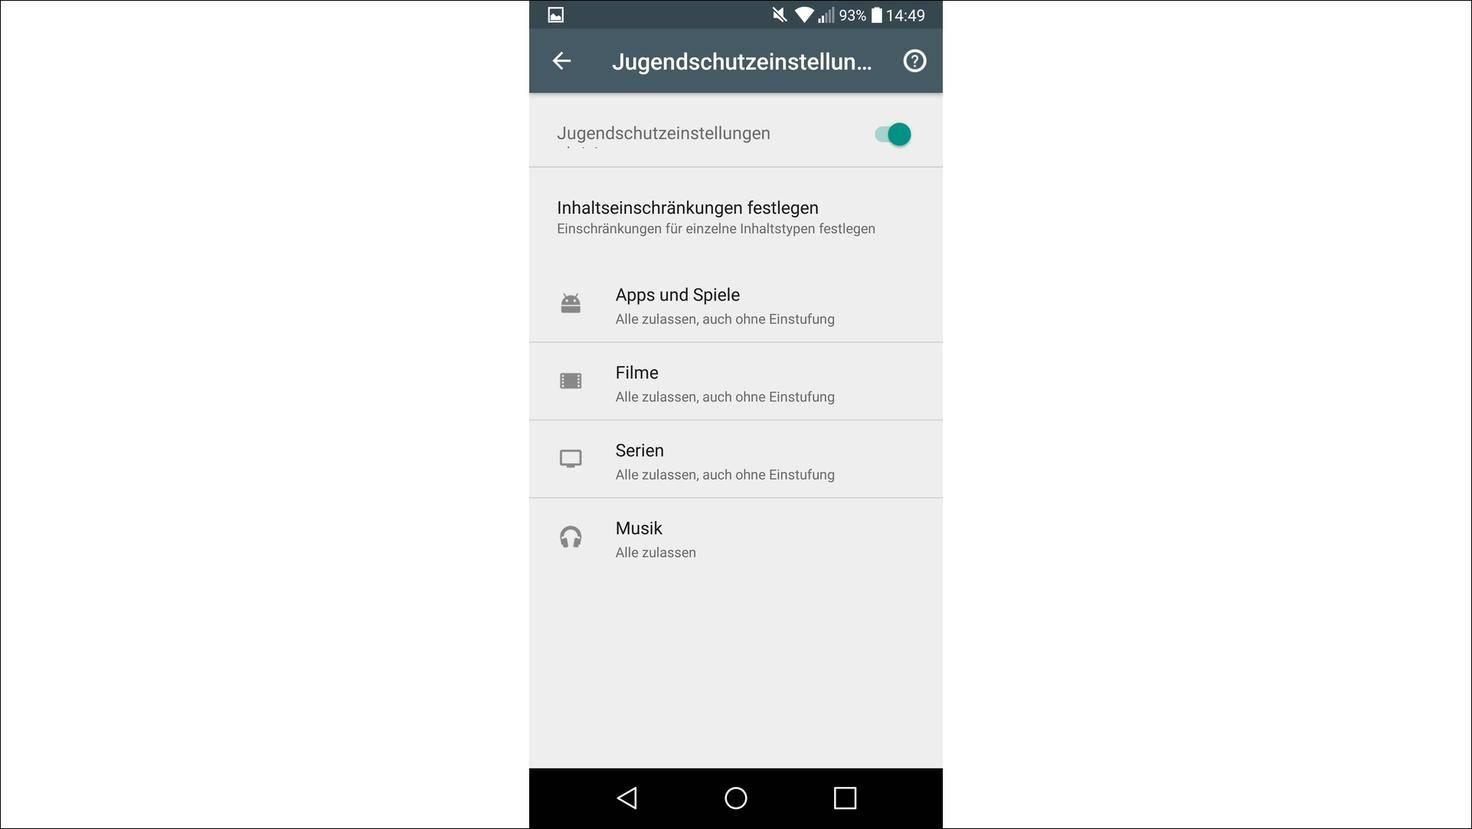 Google-Play-Store-Jugendschutzeinstellungen